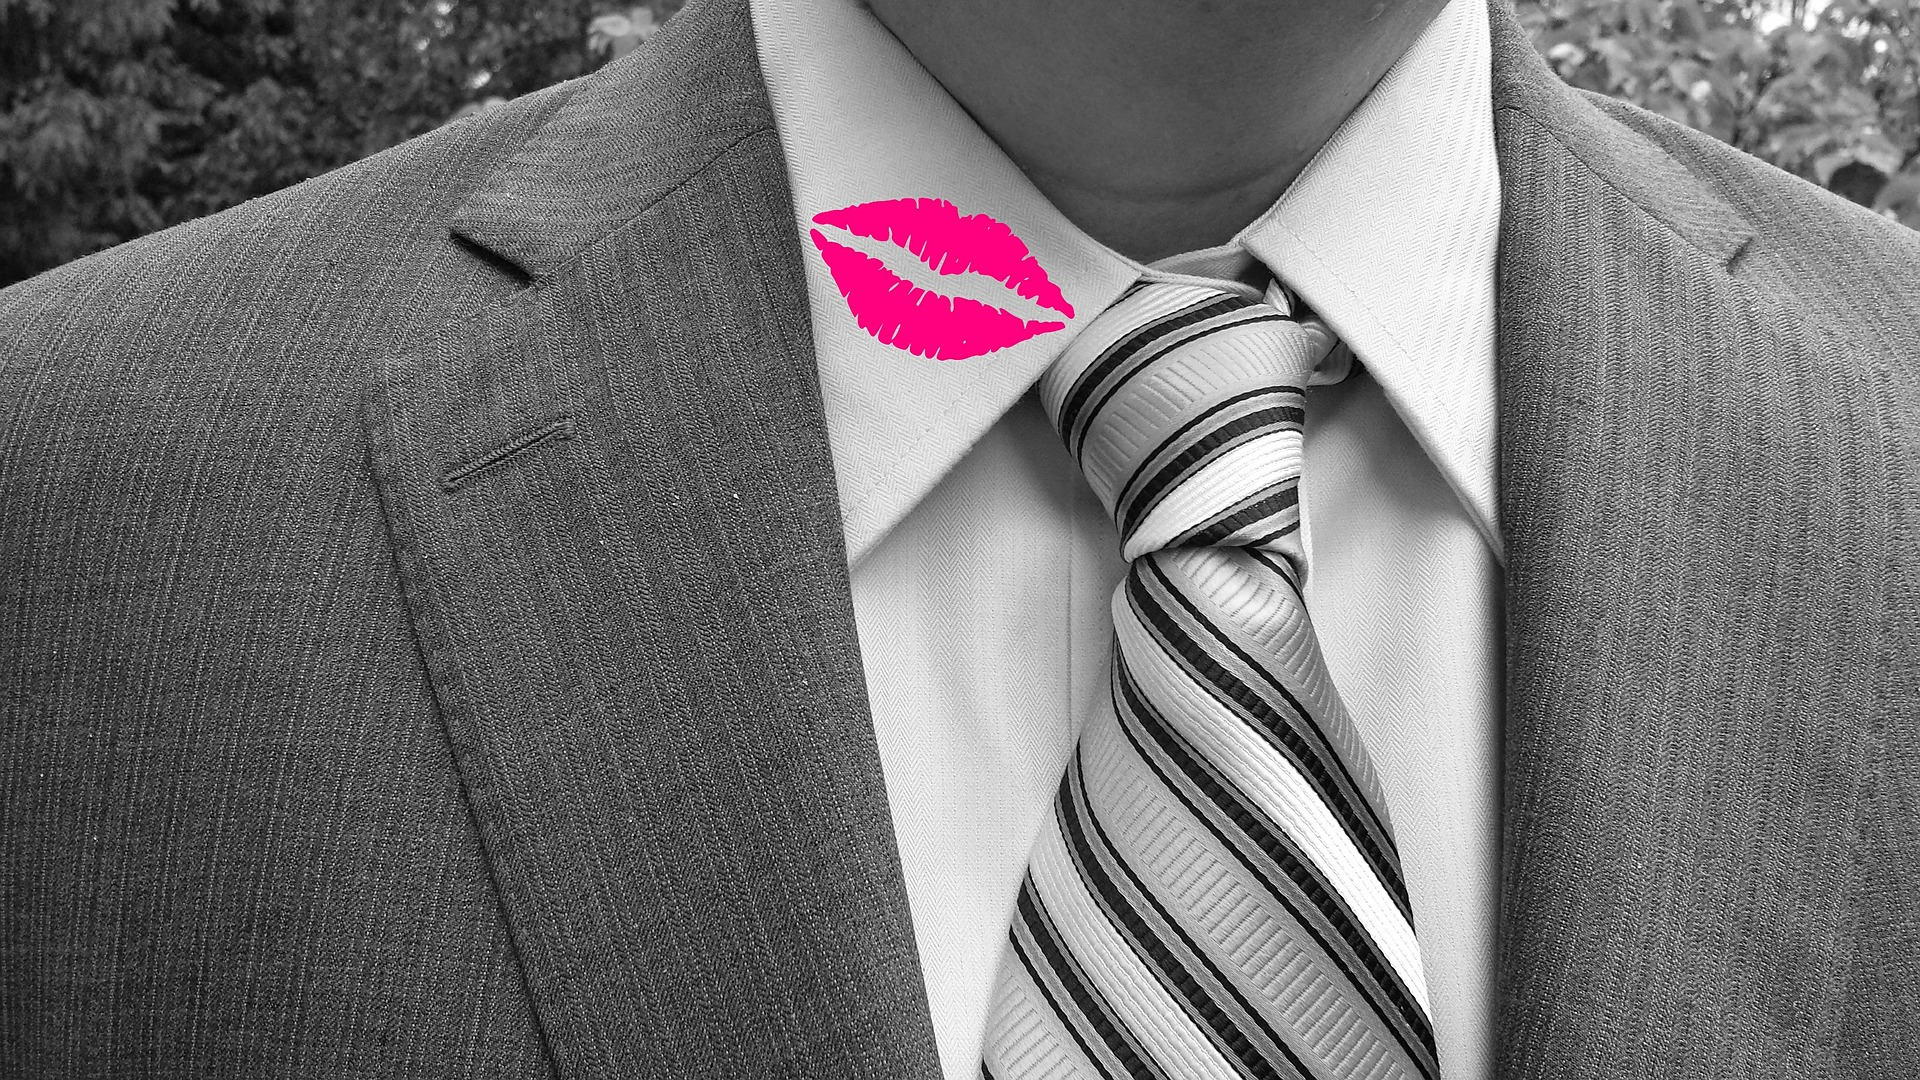 infidelitate -sfatulparintilor.ro - pixabay_com